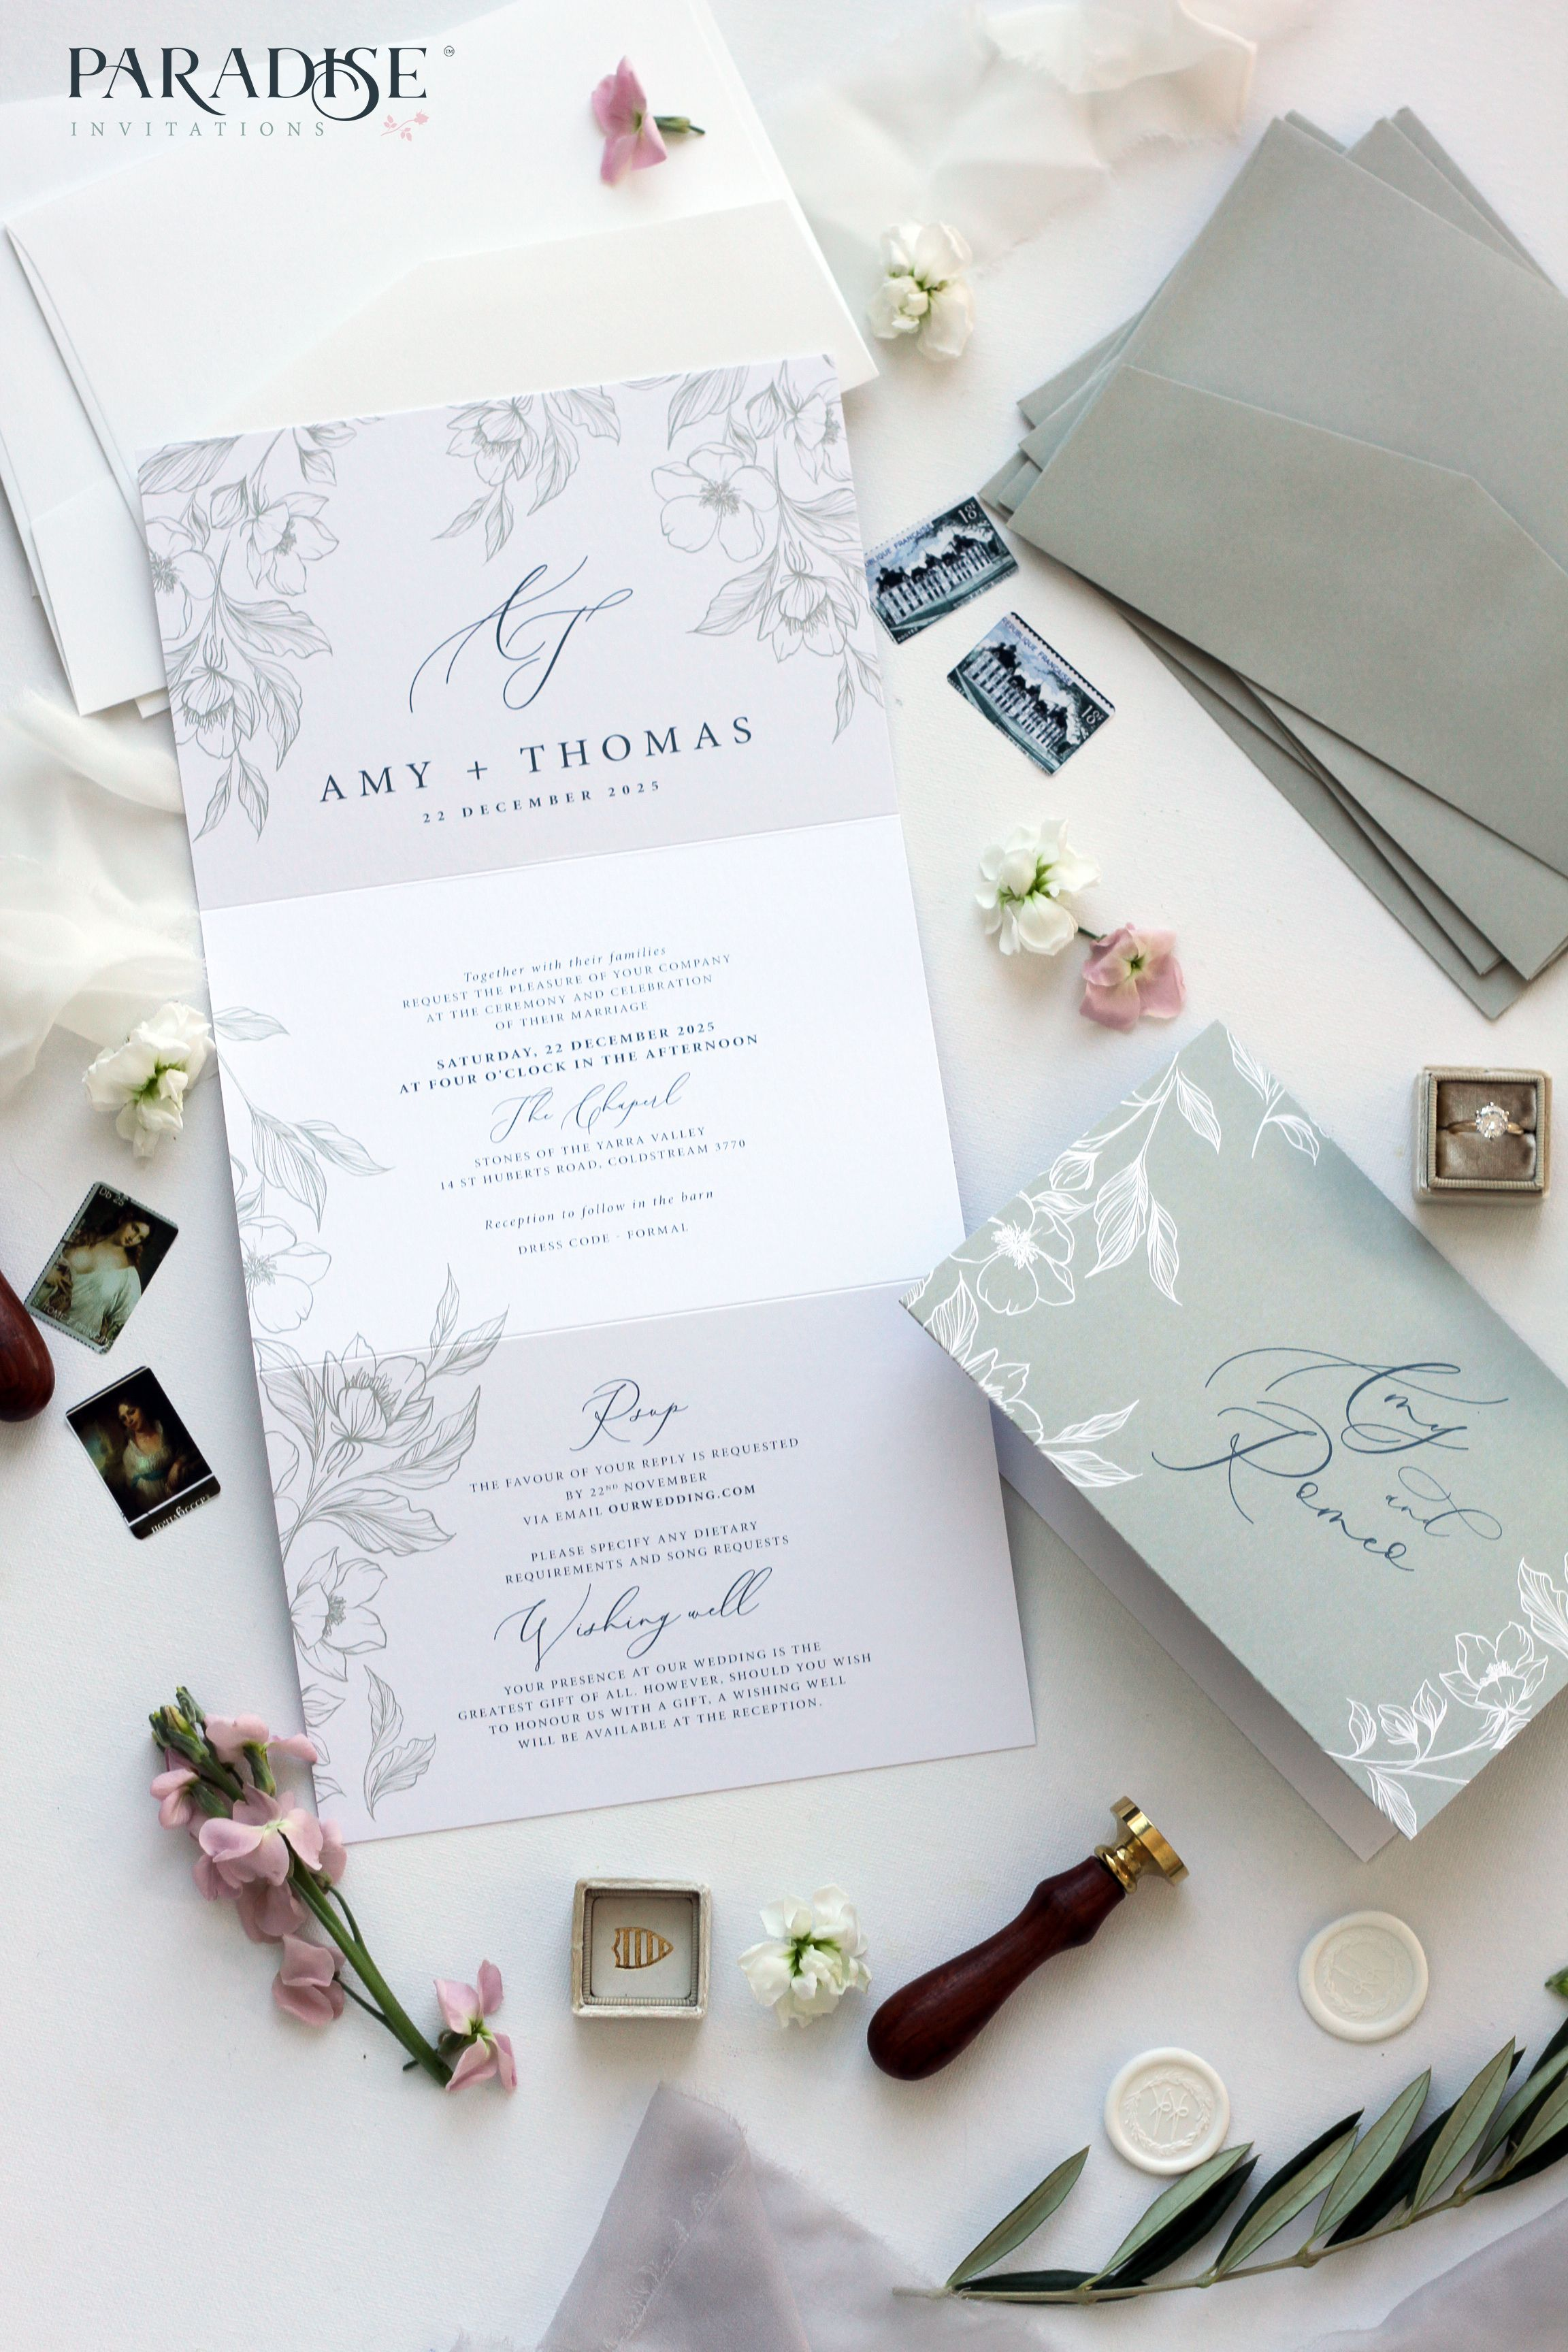 Pin By Levie Loofis On Inv Hand Drawn Wedding Invitations Tri Fold Wedding Invitations Folded Wedding Invitation